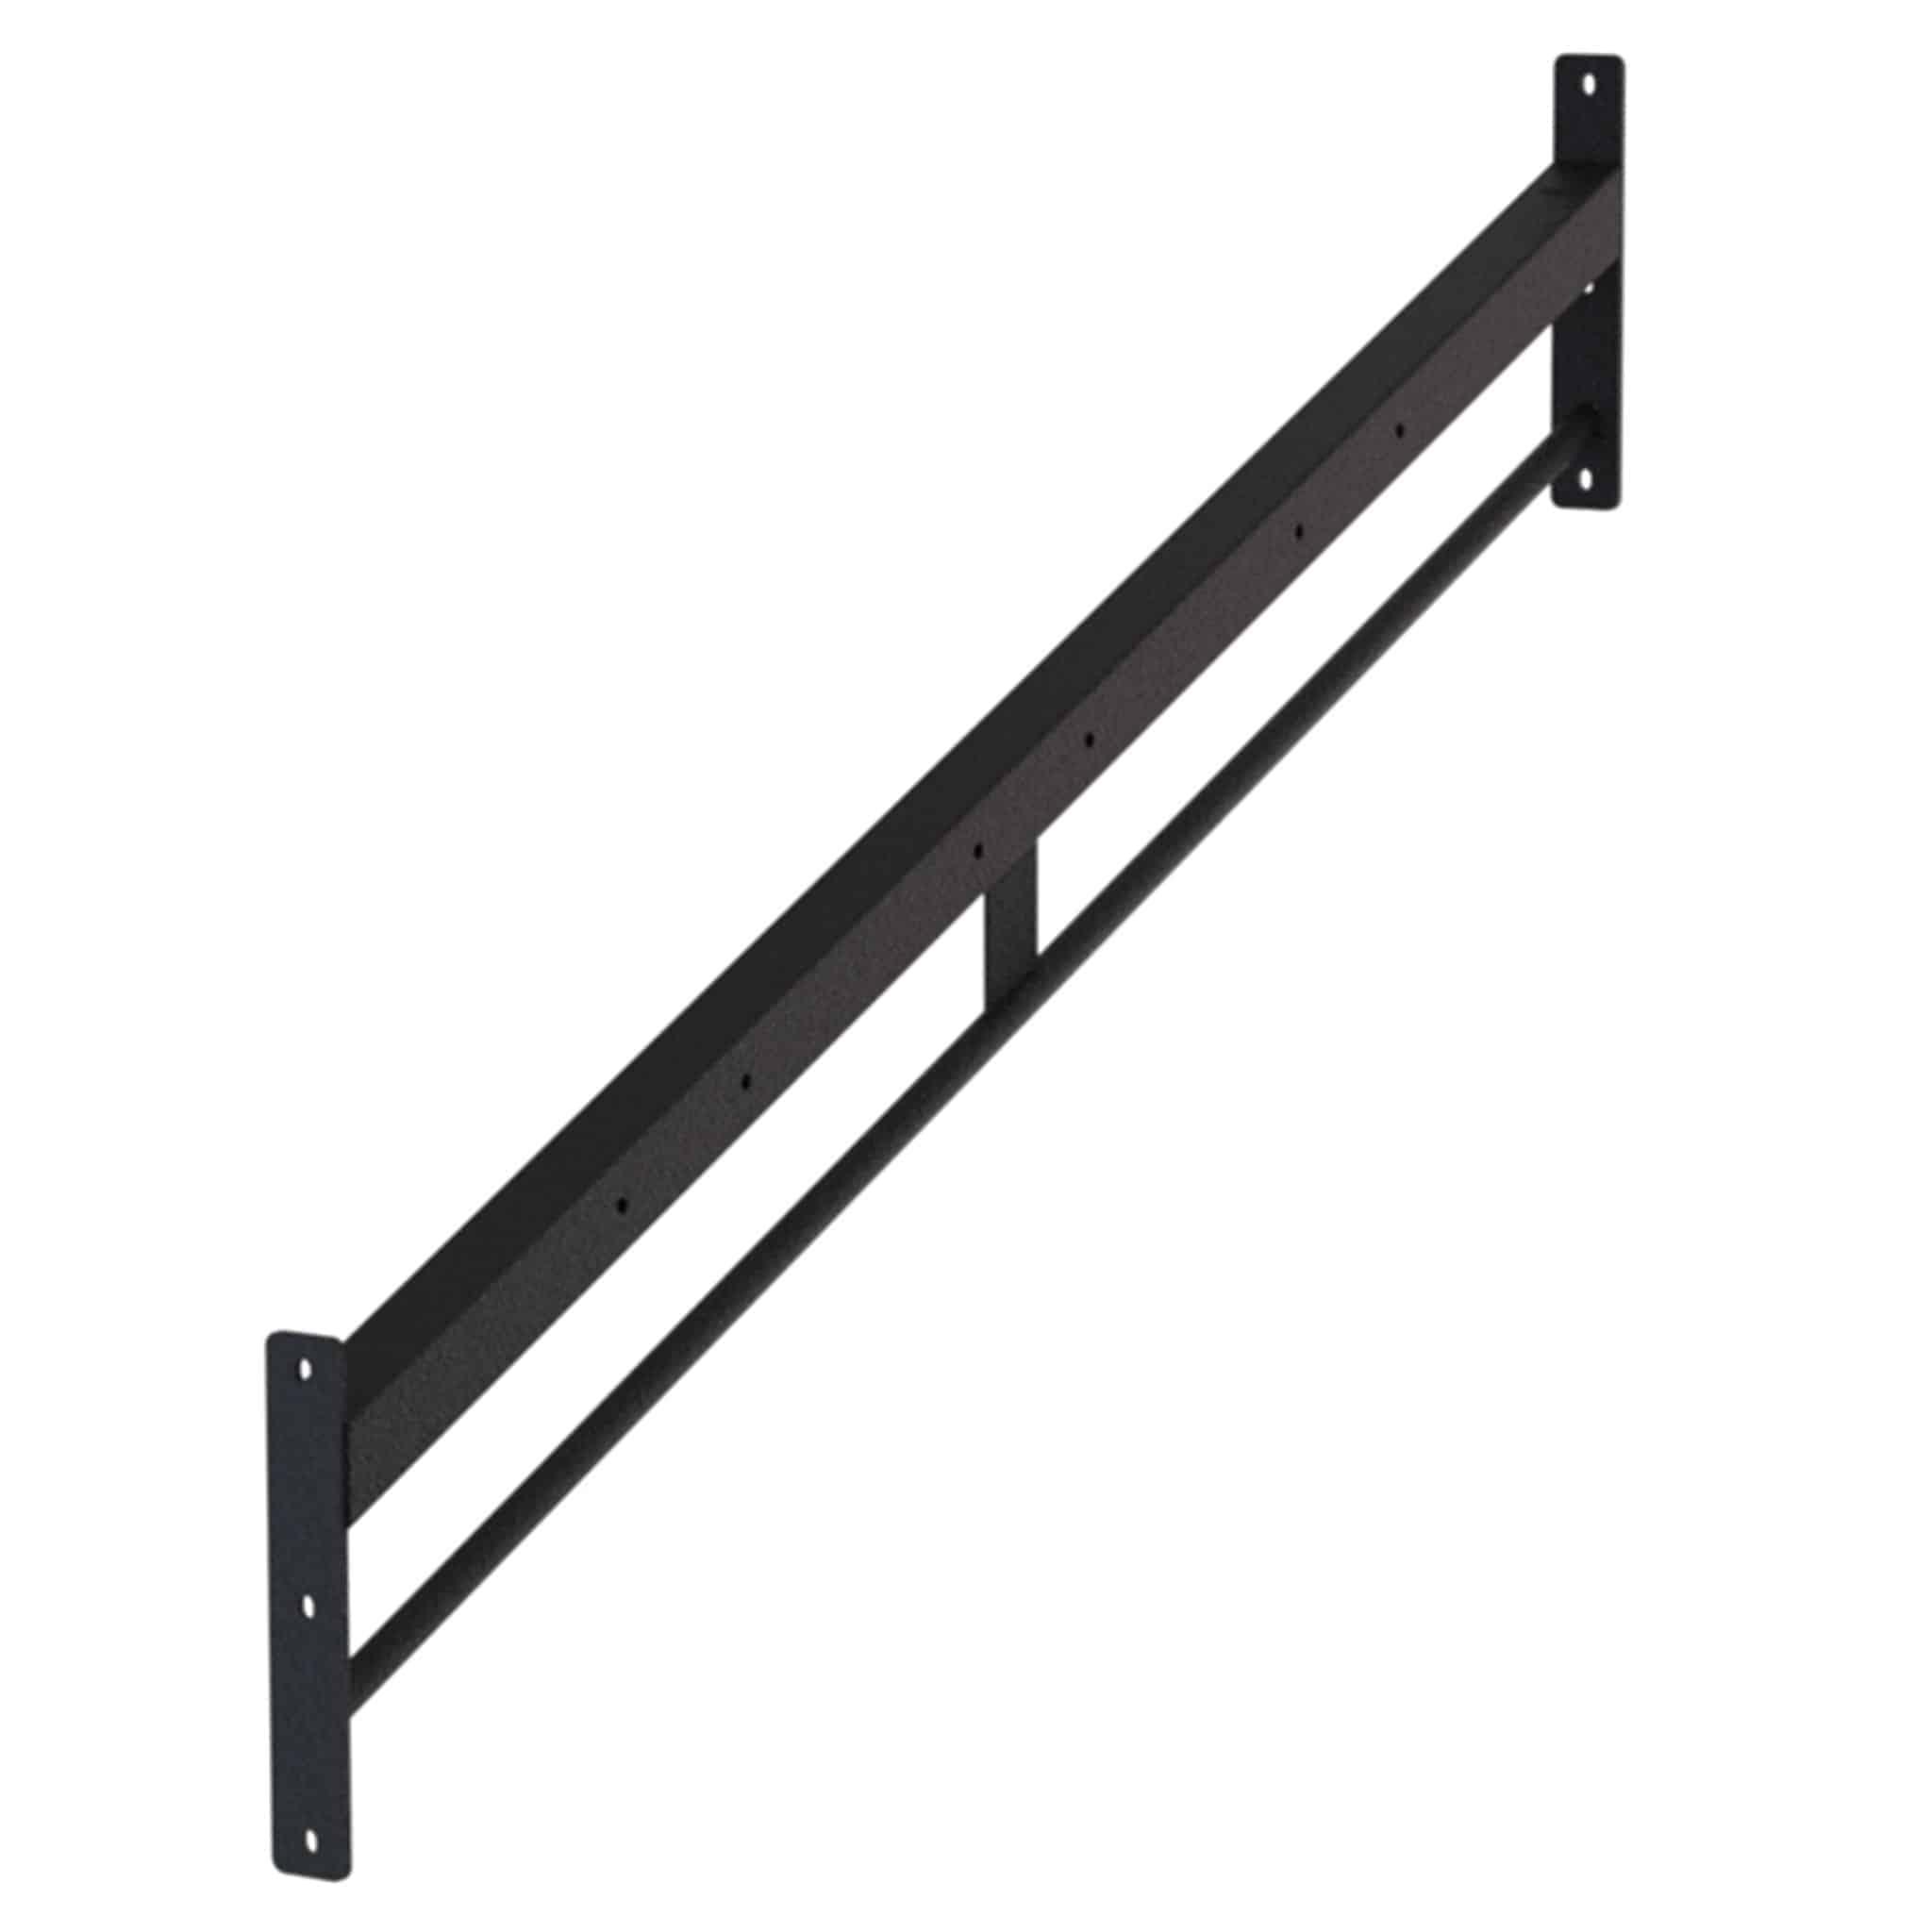 6 Ft (1.8 M) Monkey Ladder Cross